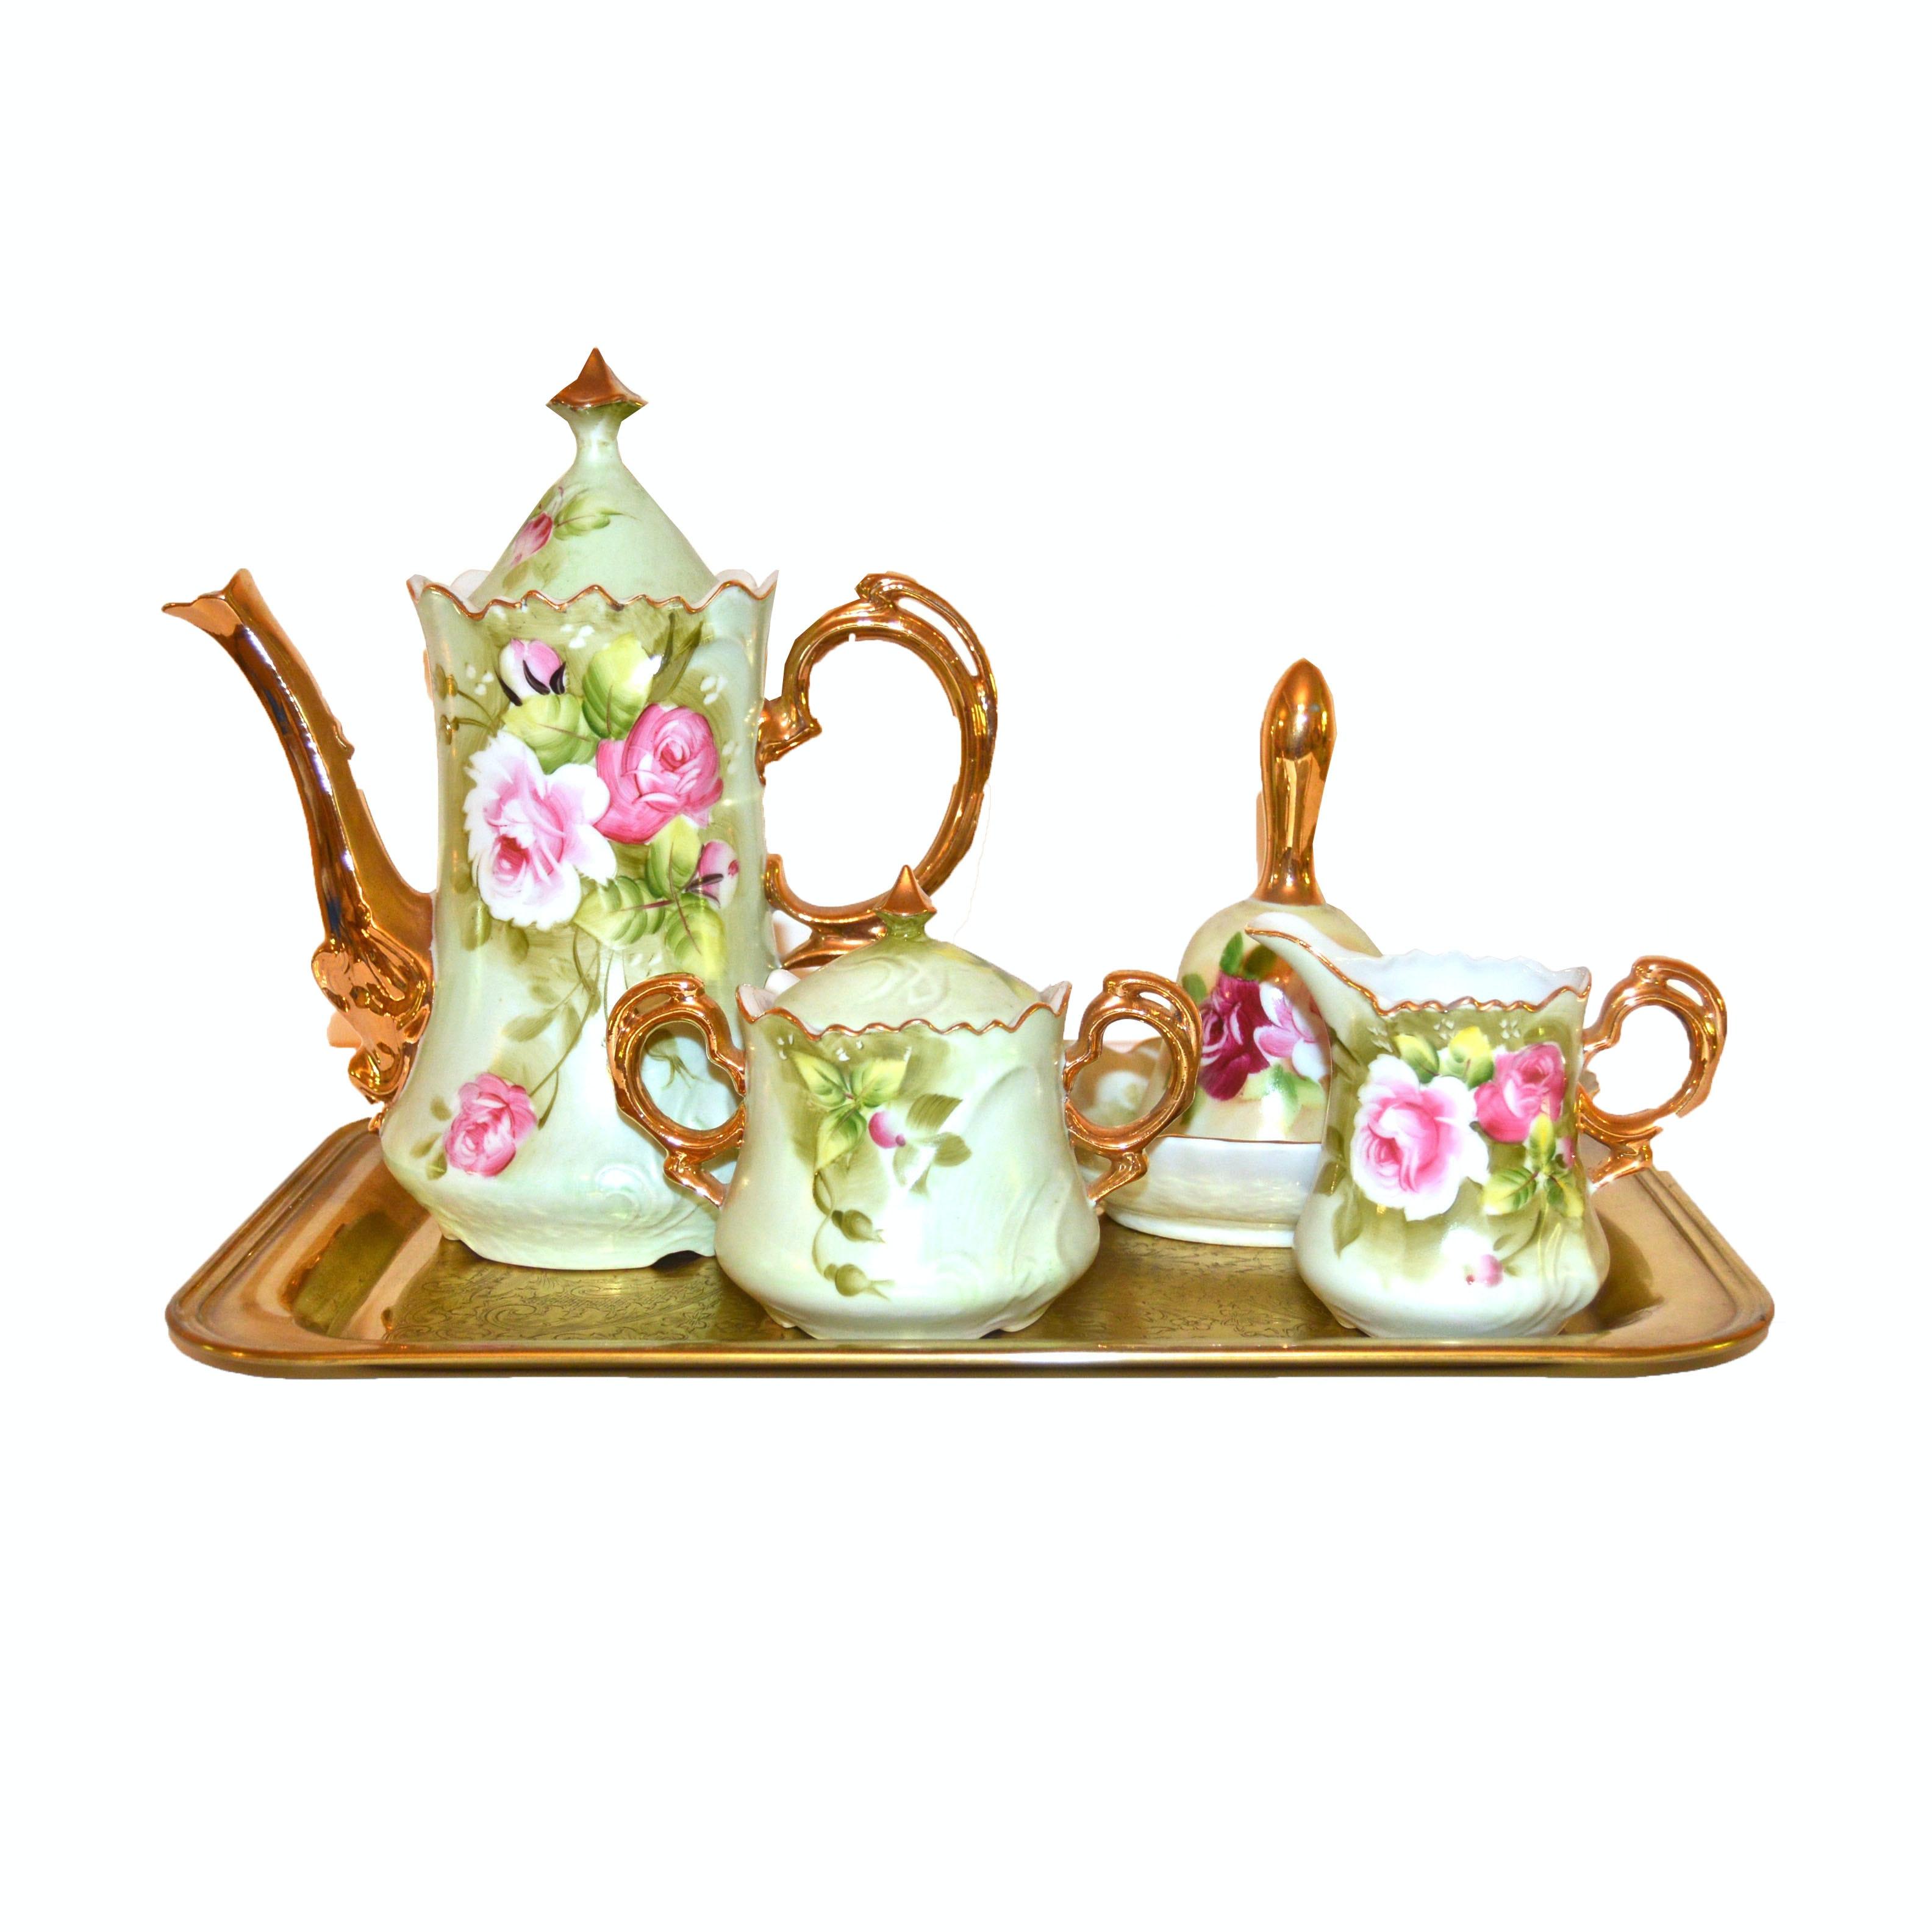 Vintage Lefton Ceramic Coffee Service Set